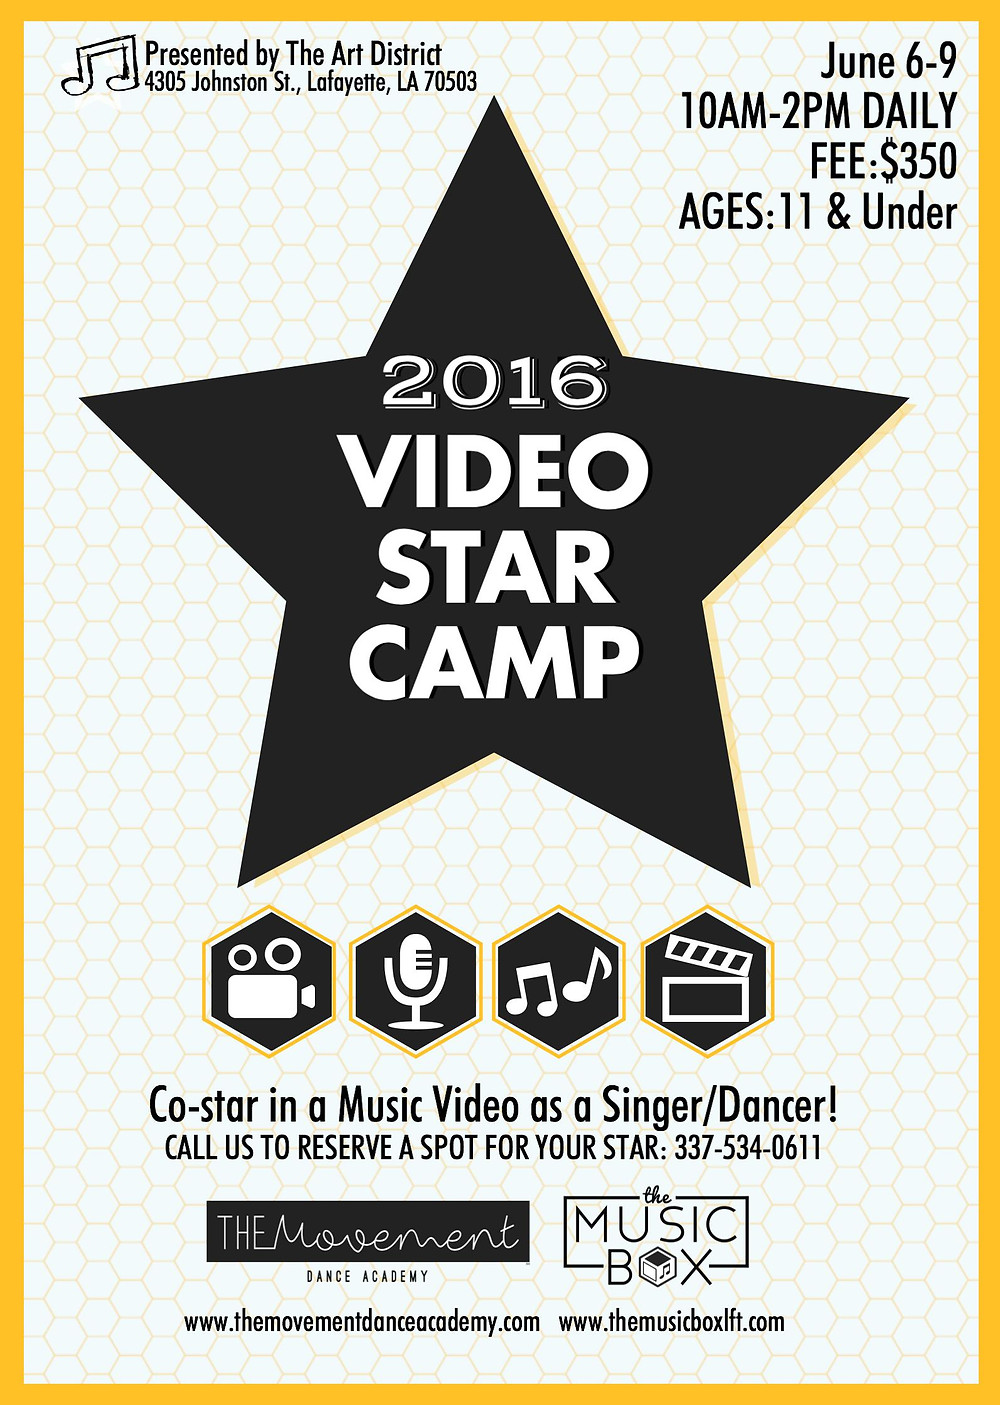 "<img src=""video-star-camp-lafayette.jpg"" alt=""Video Star Camp Lafayette"" />"